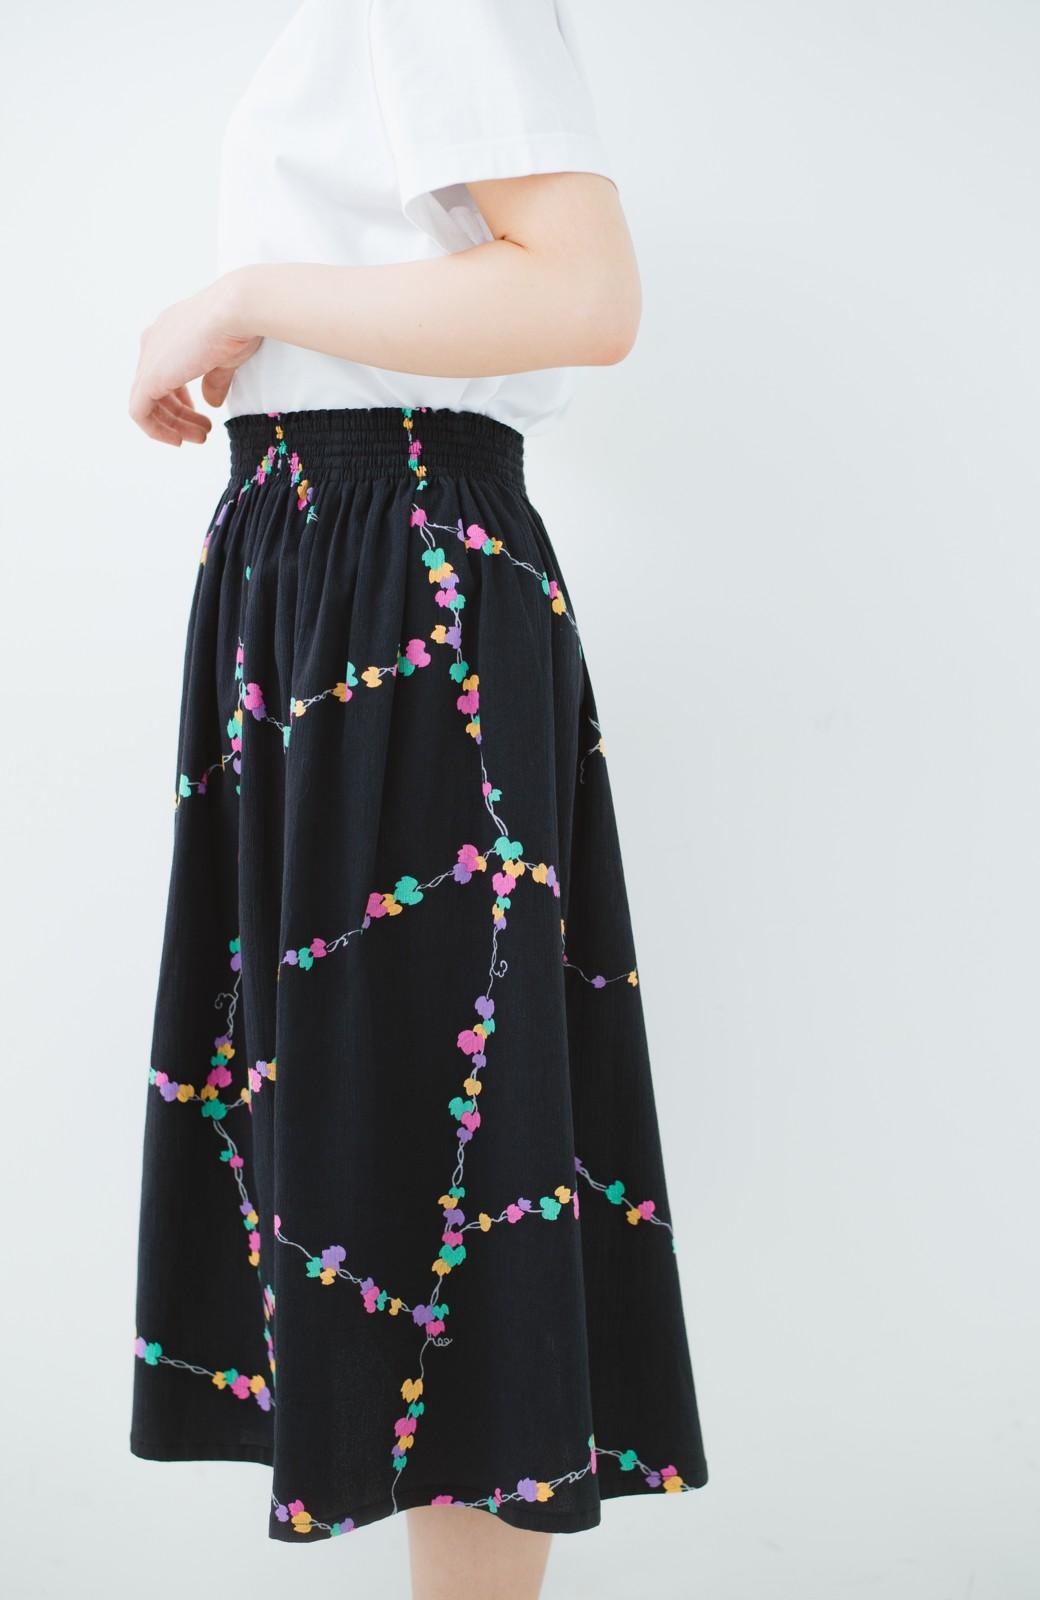 haco! 京都の浴衣屋さんと作った浴衣生地のスカート <ブラック系その他>の商品写真8